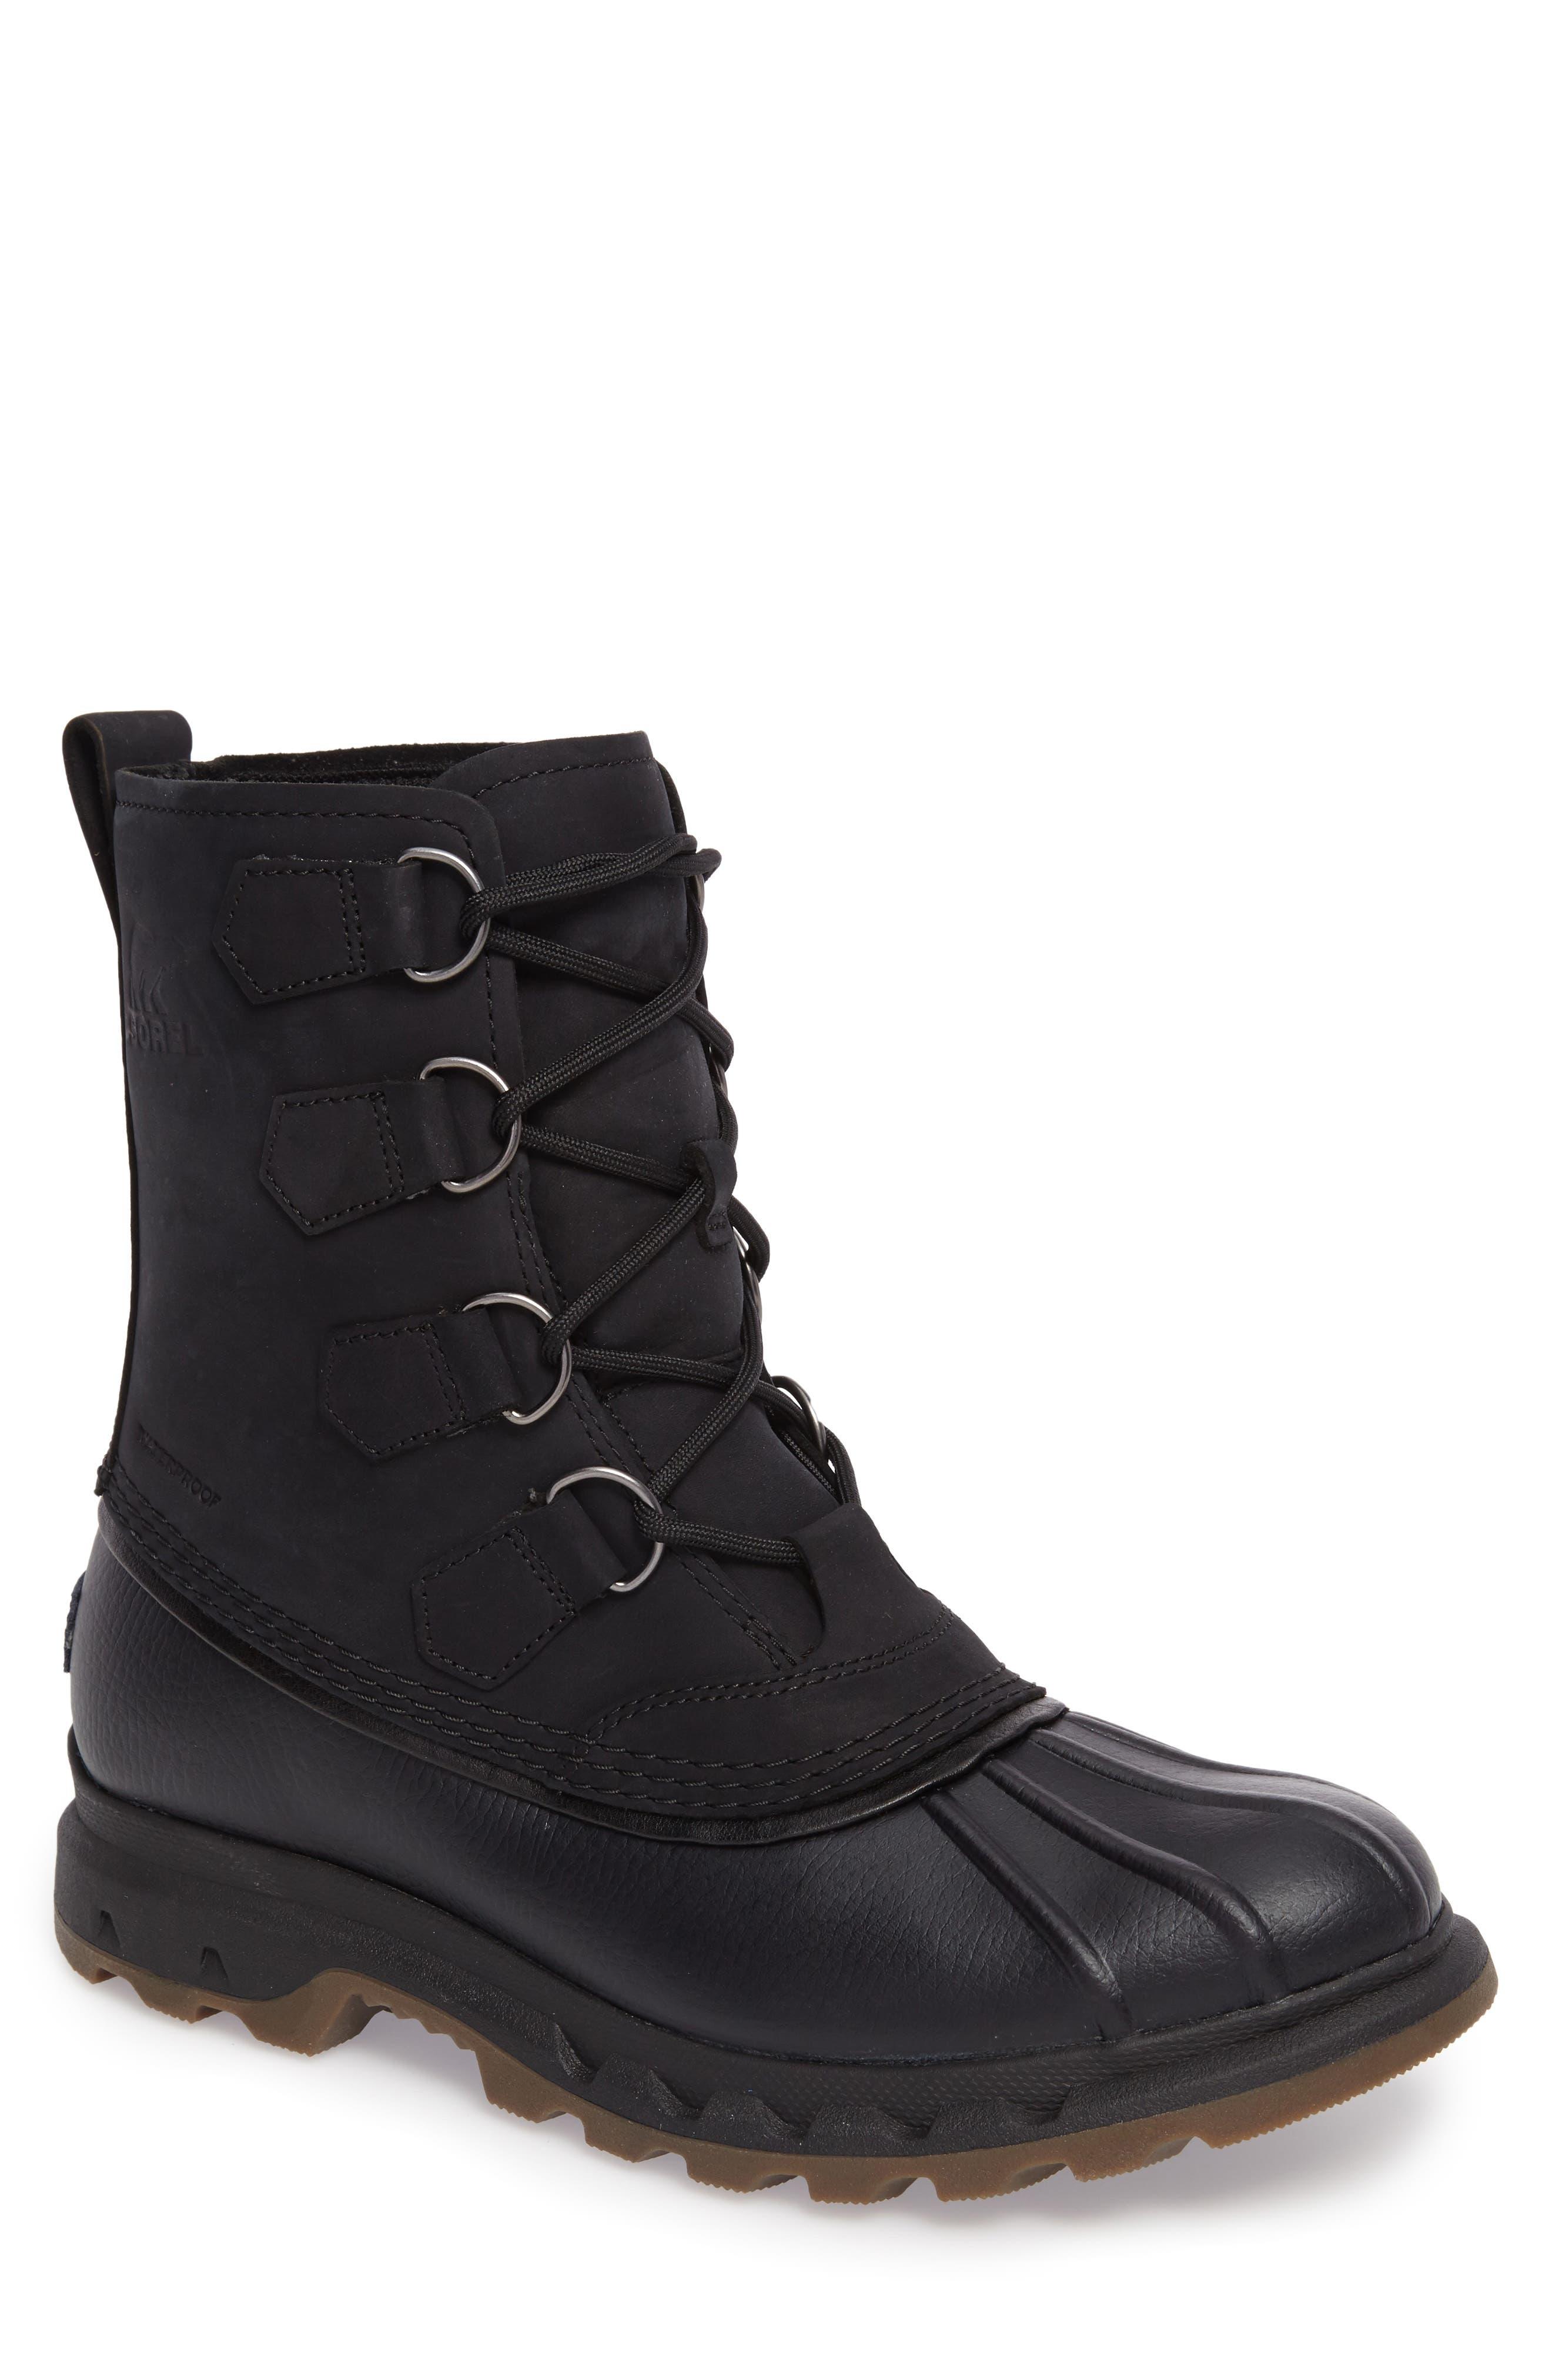 Main Image - Sorel Portzman Classic Rain Boot (Men)